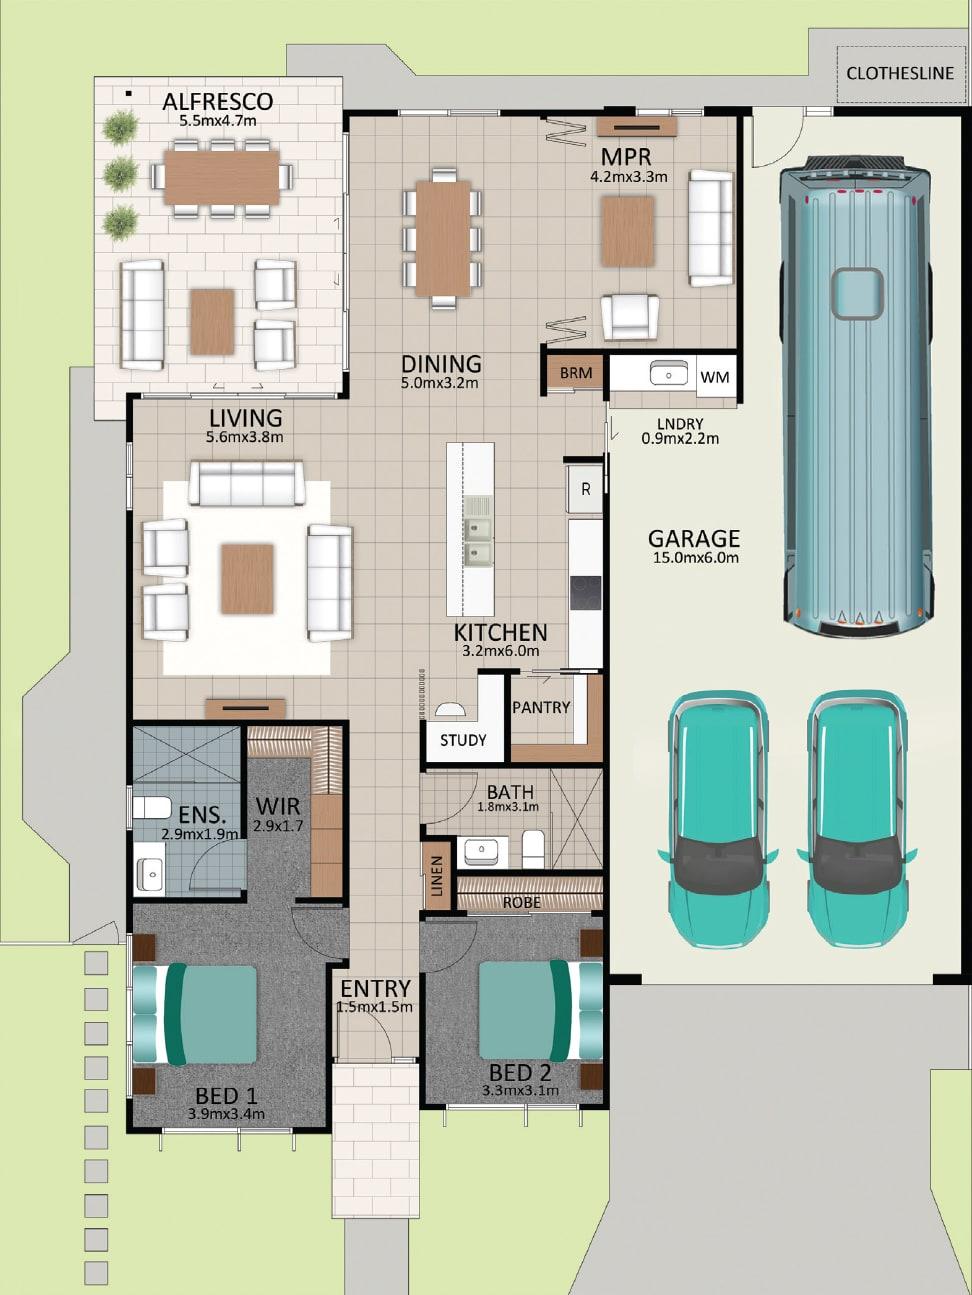 LAT25 Floorplan GAL LOT 236 FEB2021 V1 - Lot 236